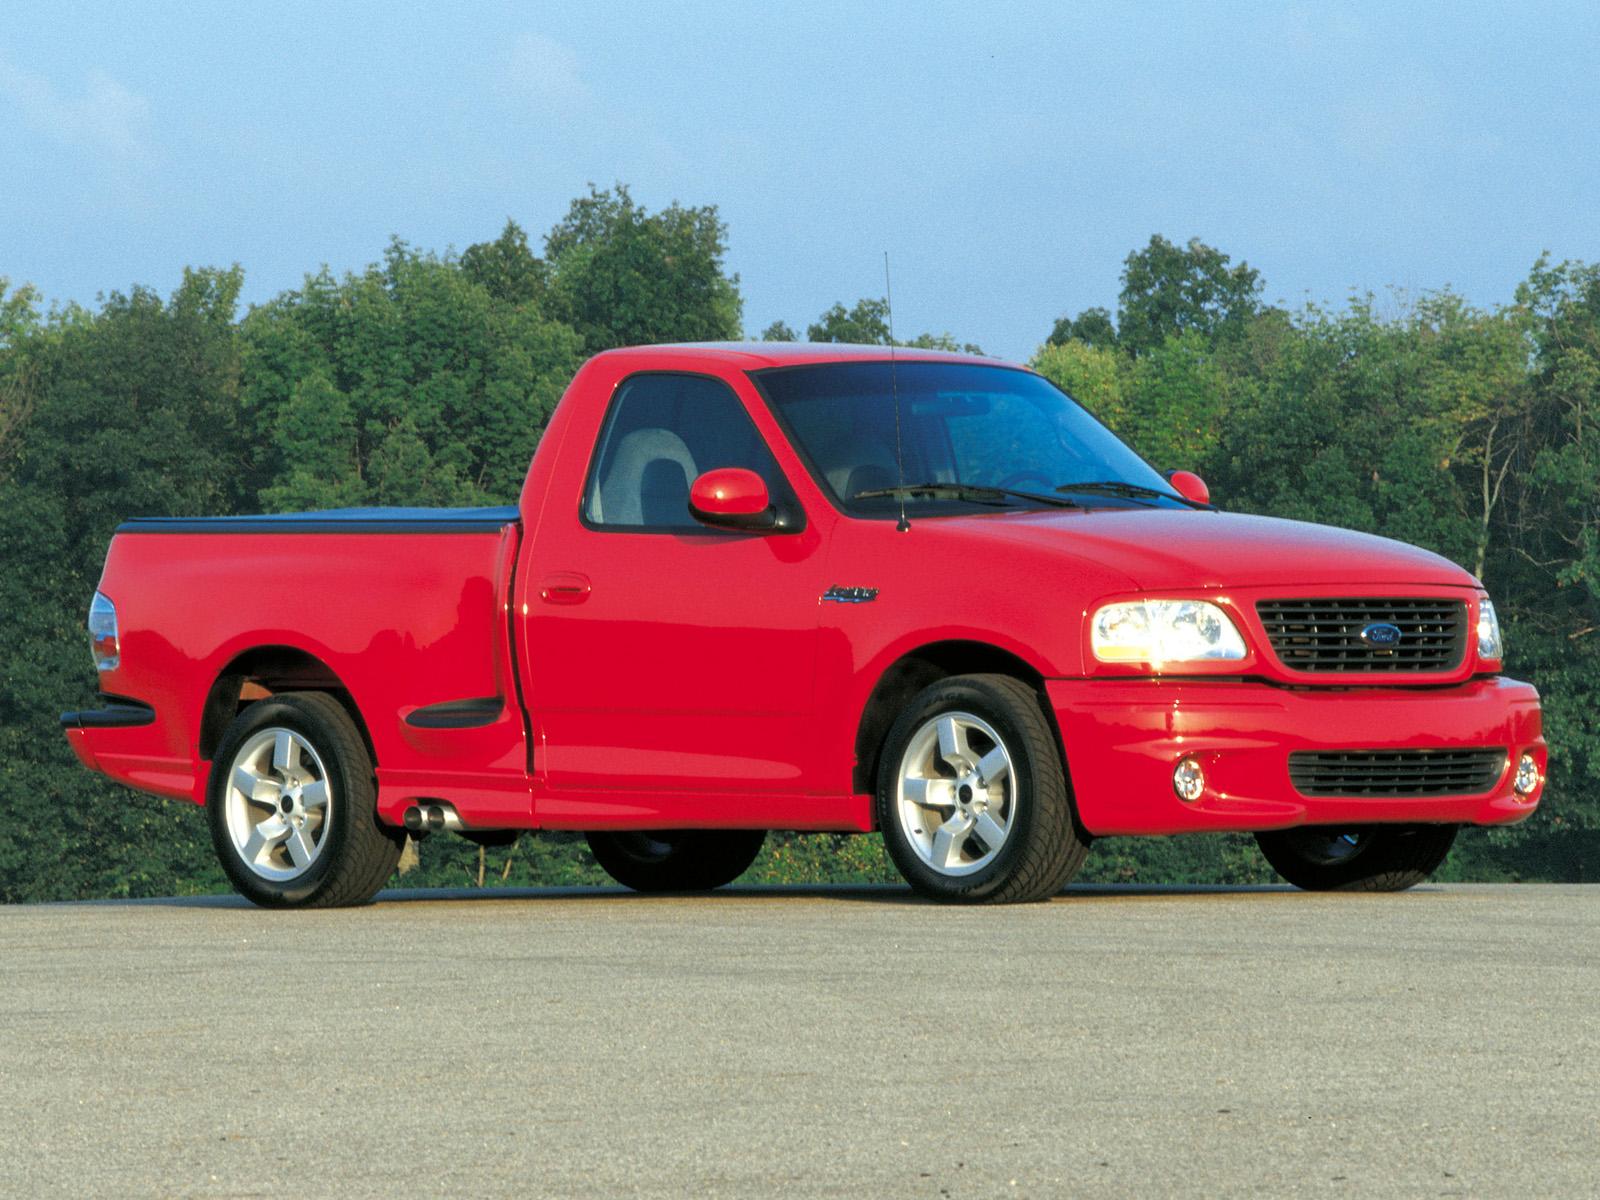 2001 Ford SVT F-150 Lightning Vermelha